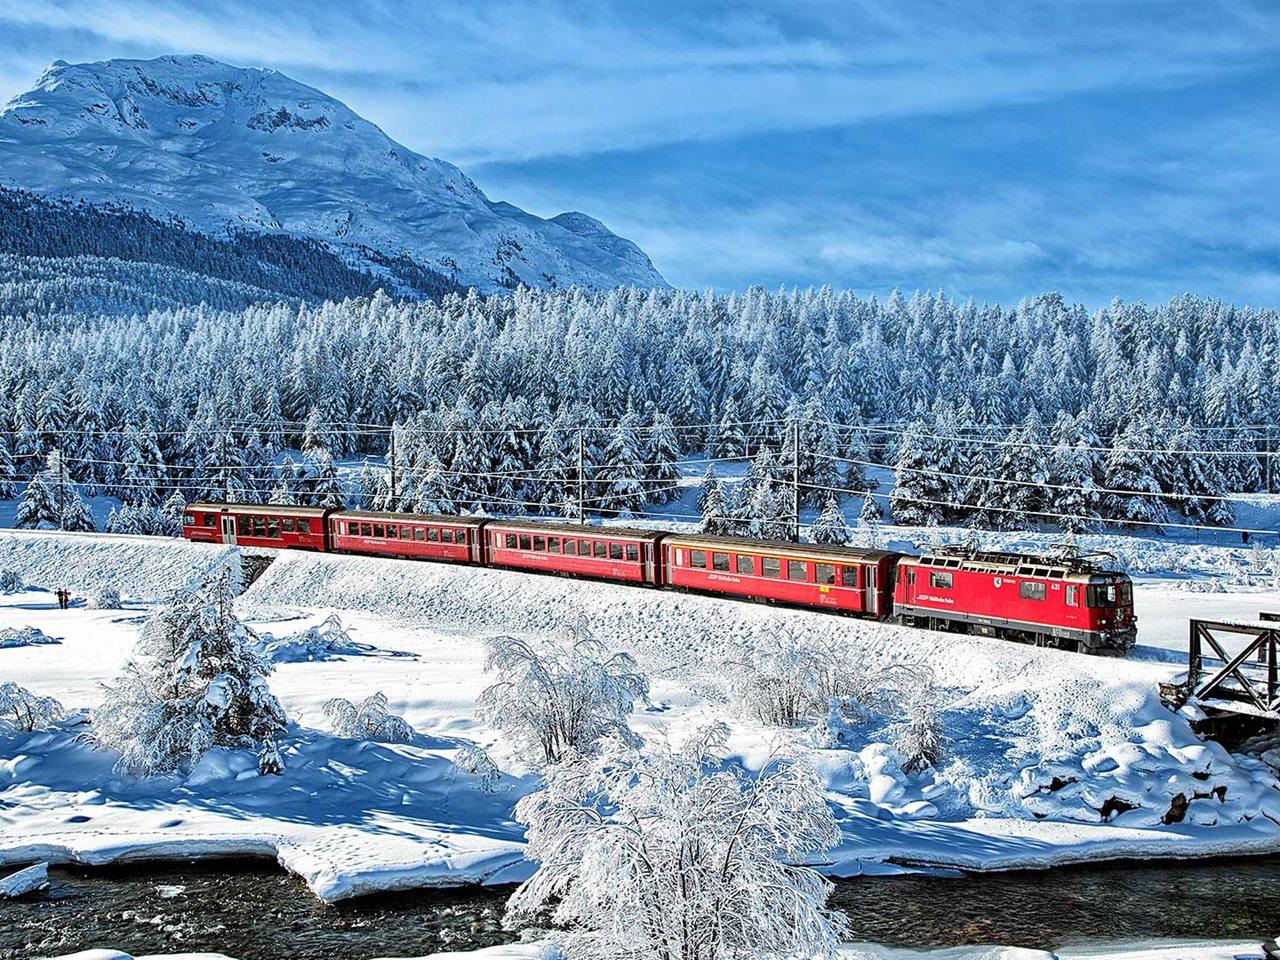 Zwitserland, Brig, , Kerstreizen, Oud, en, Nieuwreizen